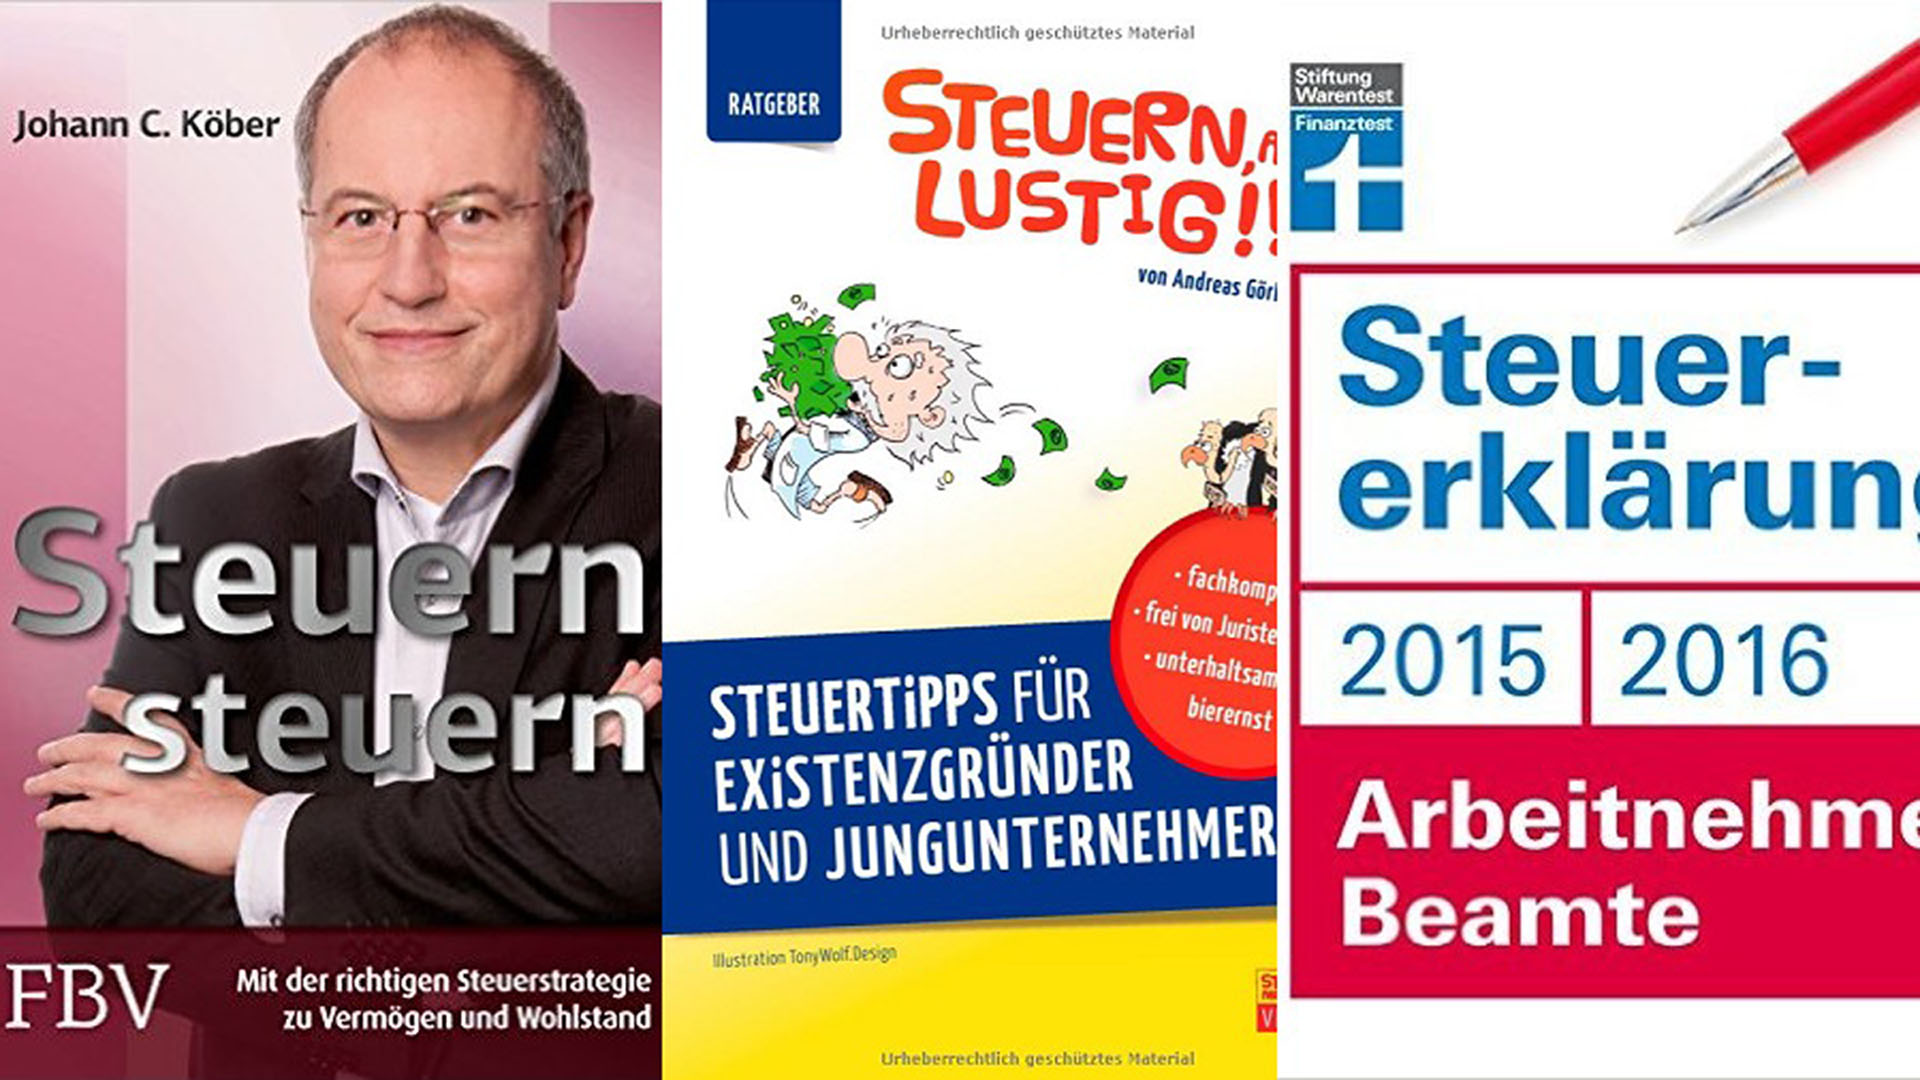 Steuer Bücher im Steuerberater Blog | Steuerberater Blog